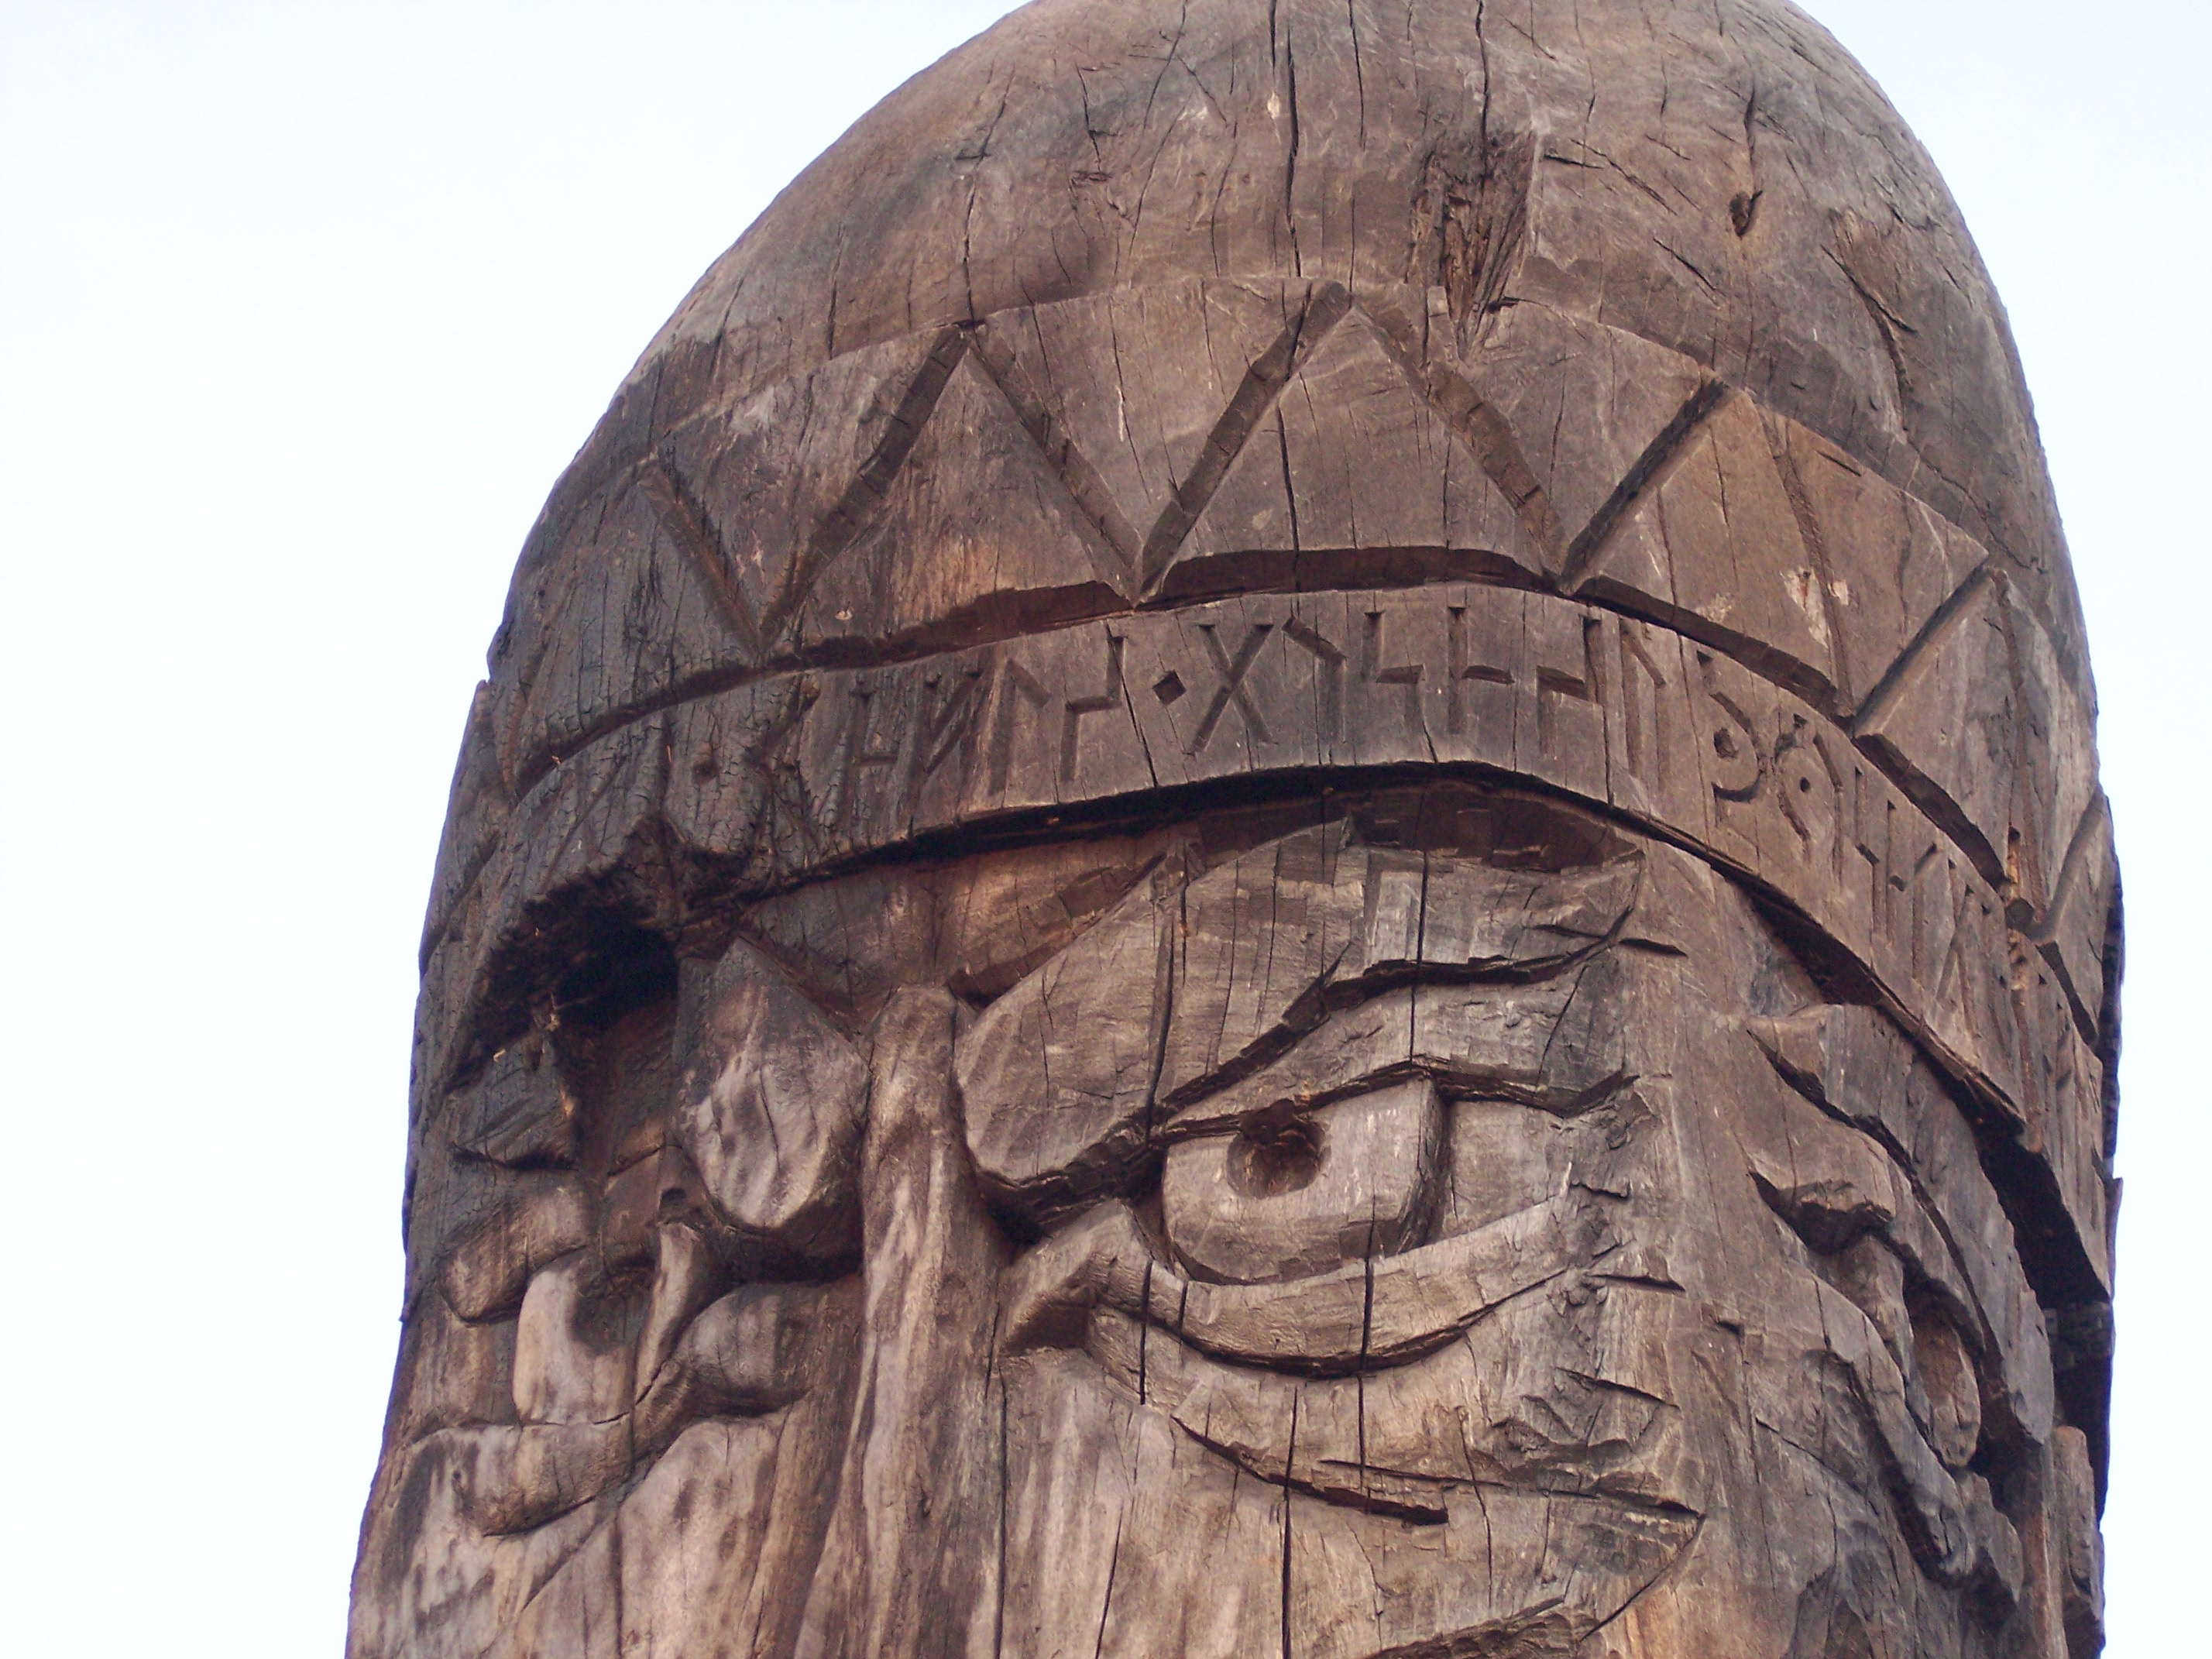 Perun idol at Vladivostok (Владивосток) Russia